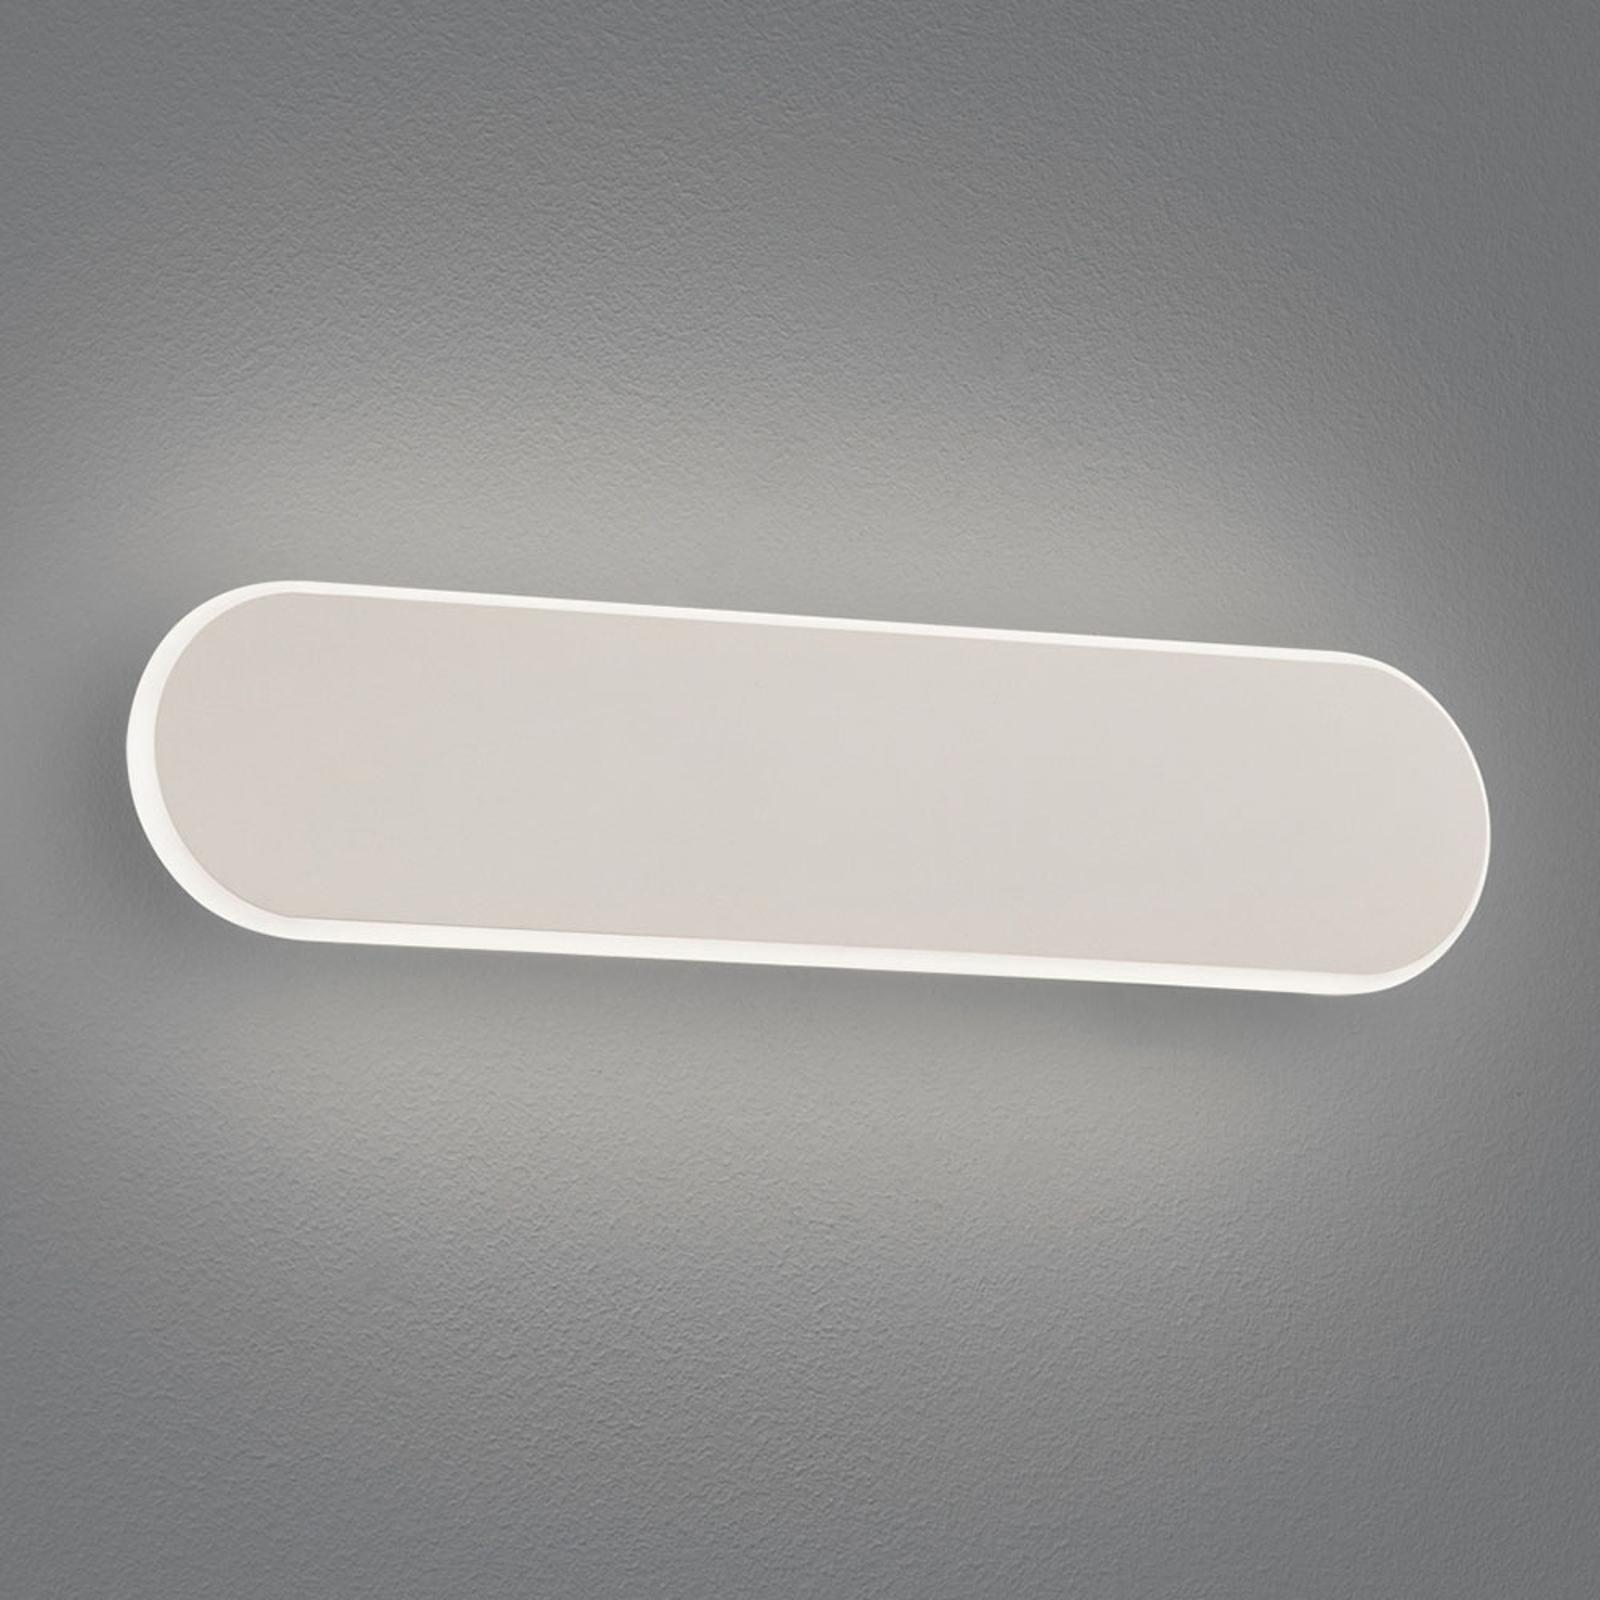 LED-vegglampe Carlo, Switchdim, 35 cm, hvit